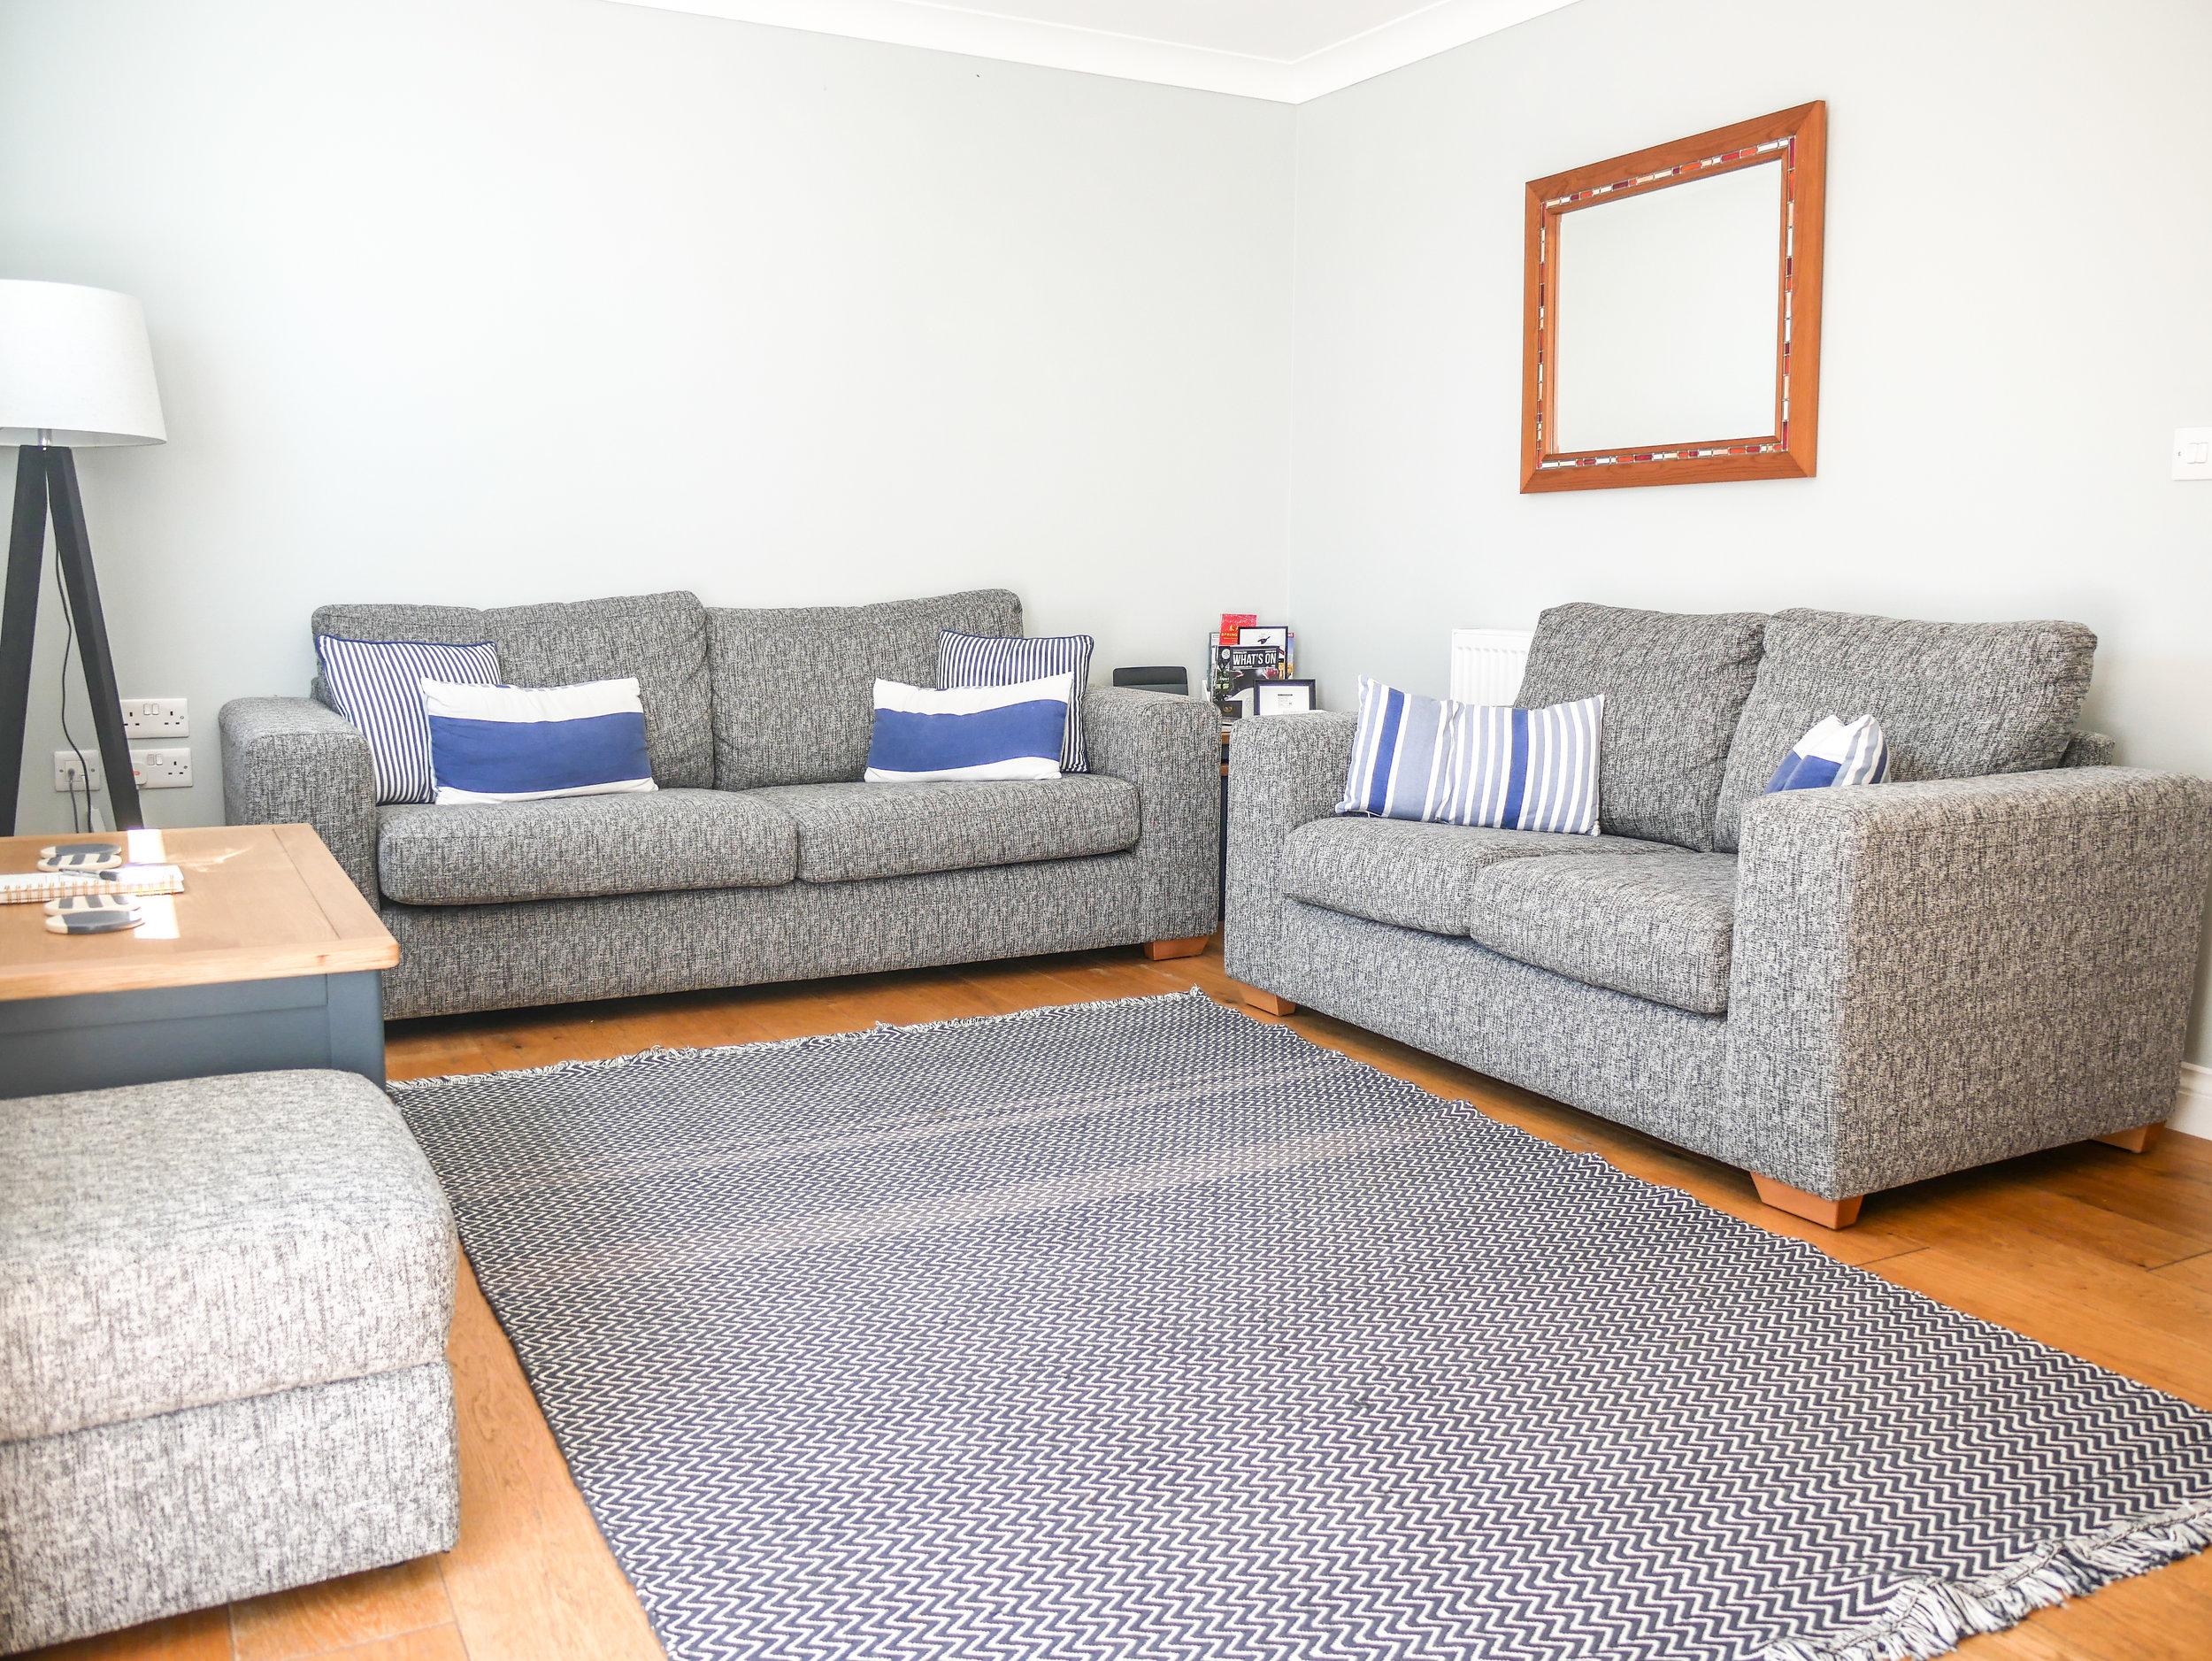 frontroomchairs.jpg